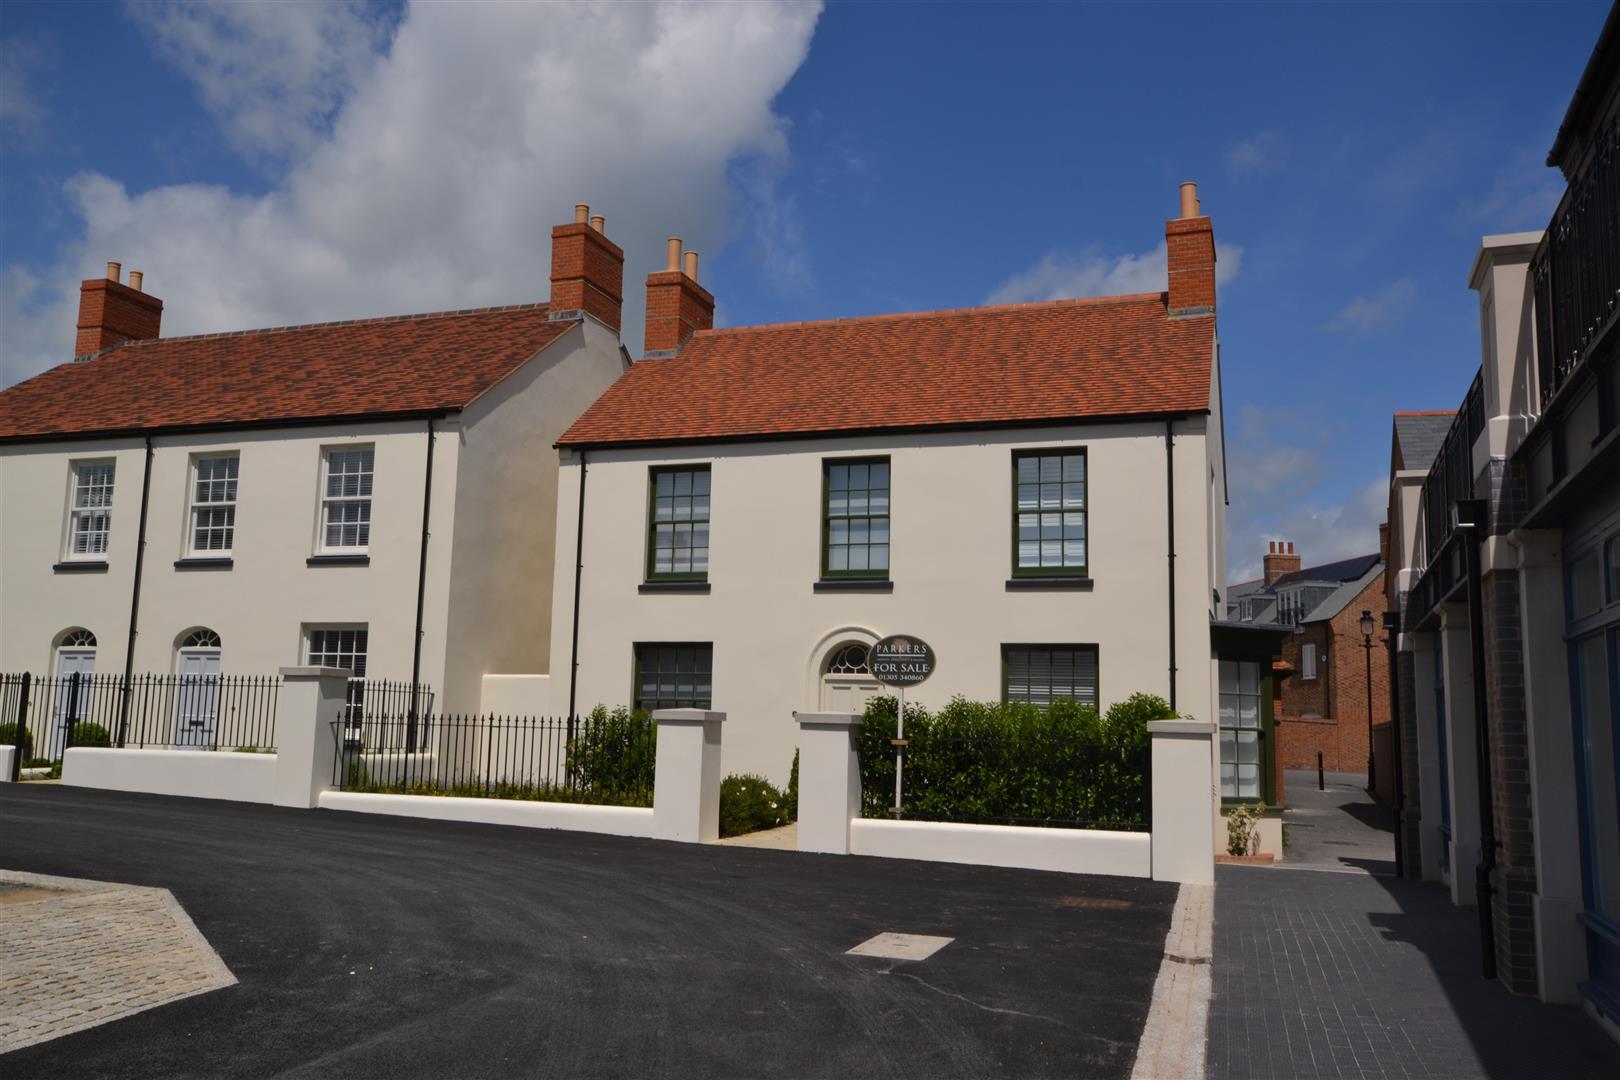 Hamslade Green, Poundbury, Dorchester